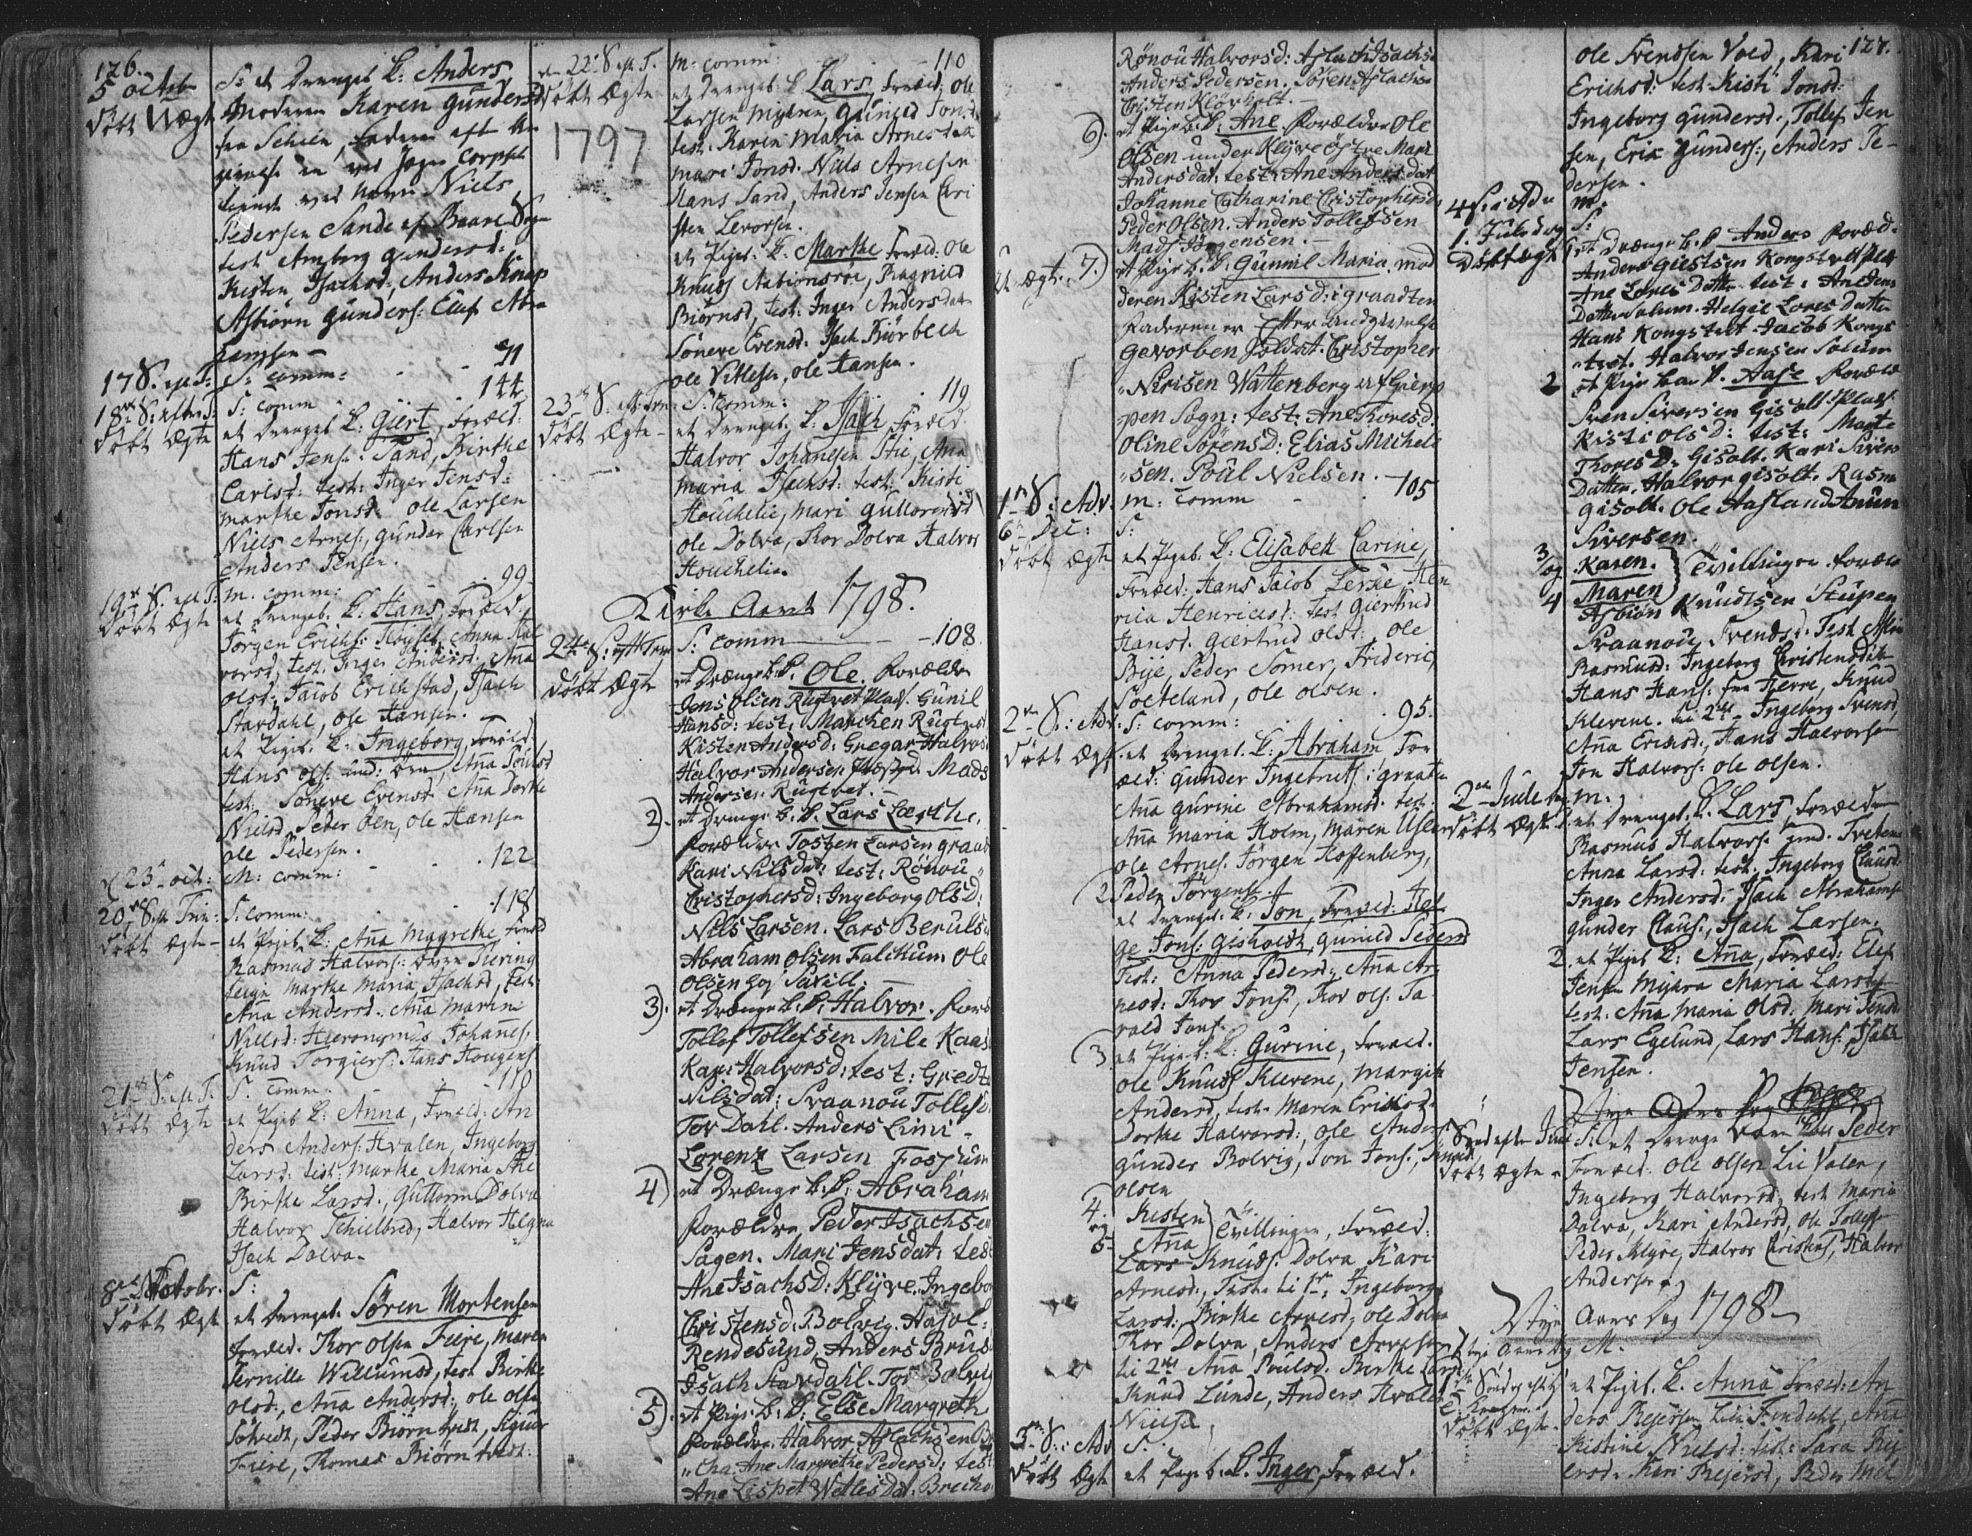 SAKO, Solum kirkebøker, F/Fa/L0003: Ministerialbok nr. I 3, 1761-1814, s. 126-127